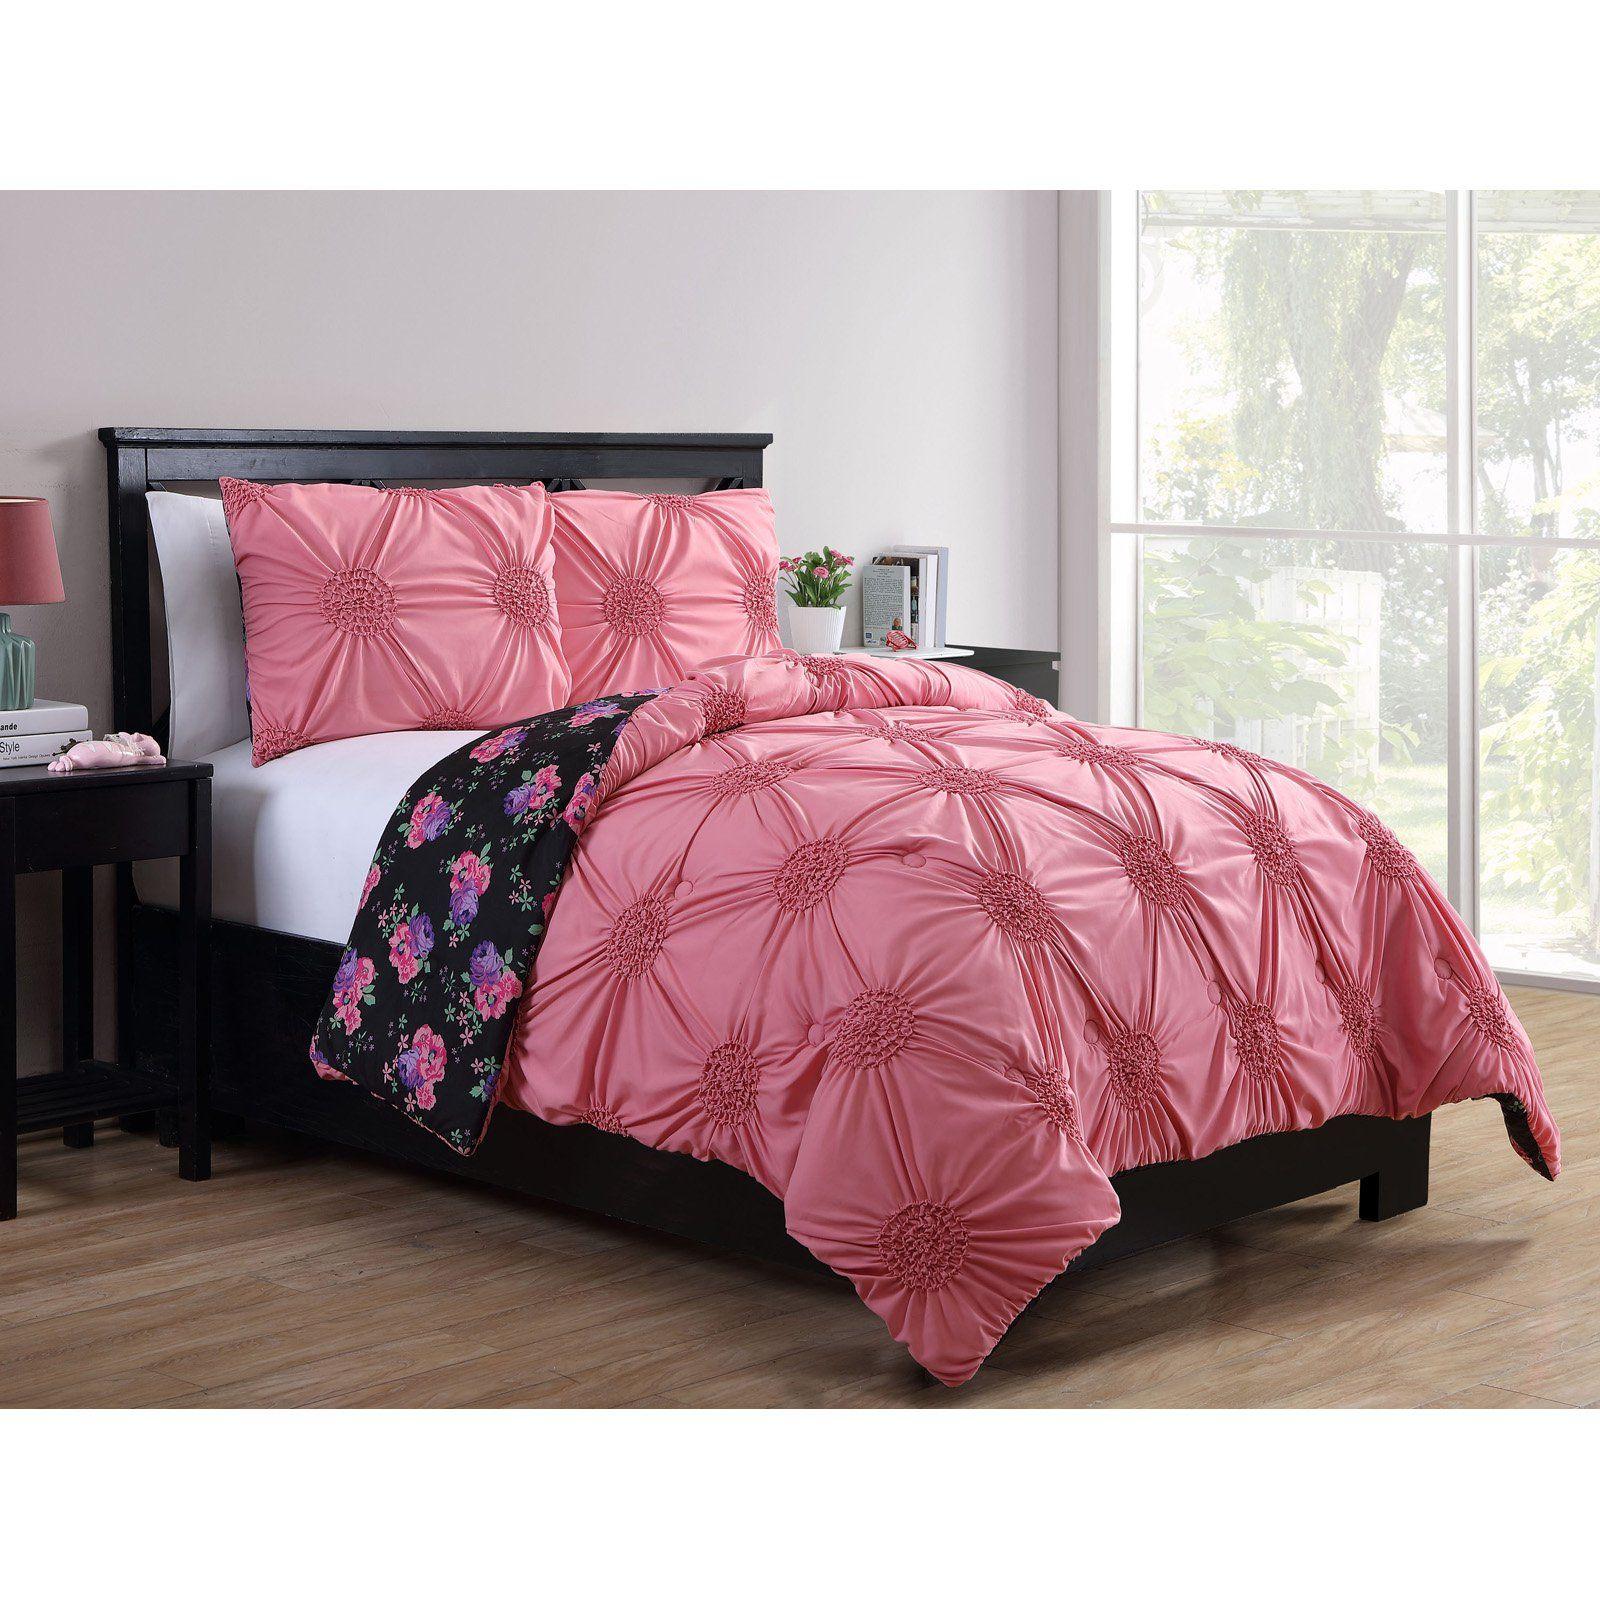 Dusty Rose Kids Reversible Comforter Set By Better Homes Gardens